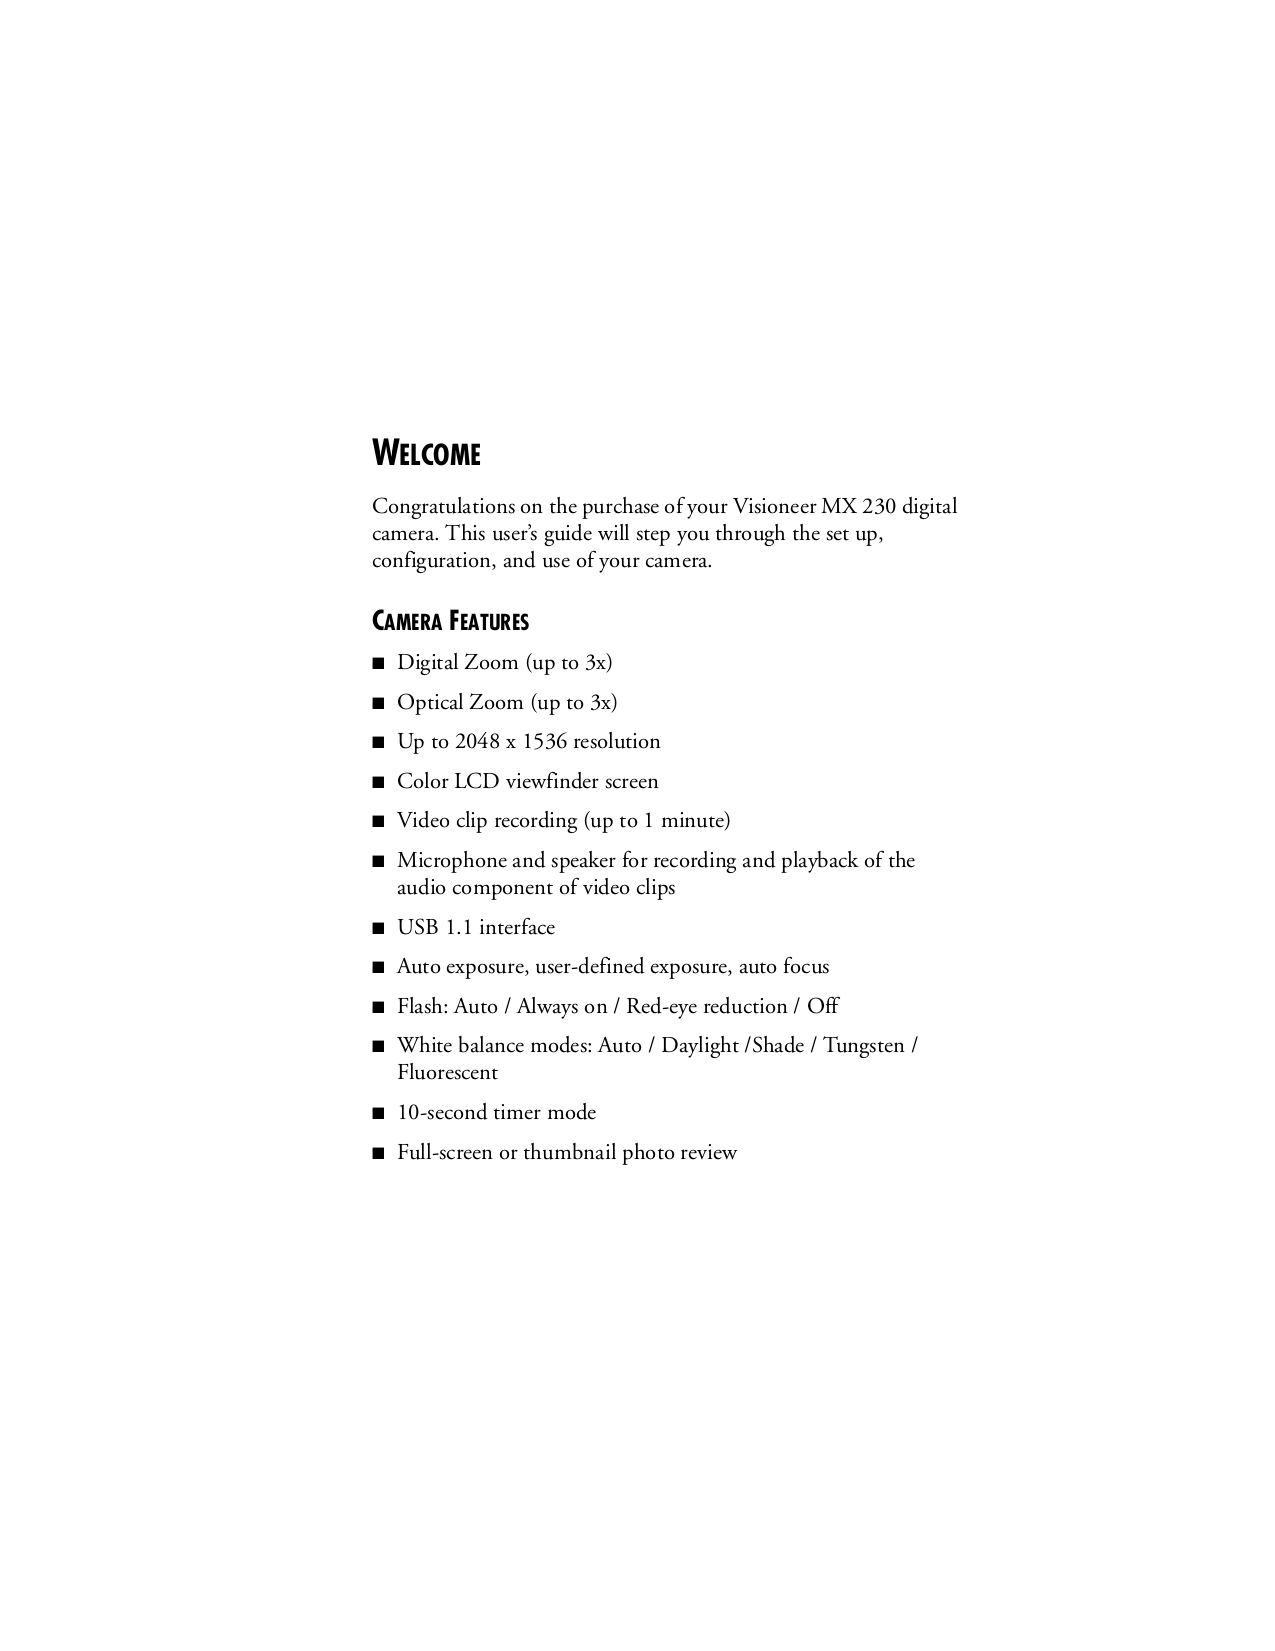 pdf manual for visioneer digital camera mx 230 rh umlib com Sony Digital Camera PowerShot Camera Manual